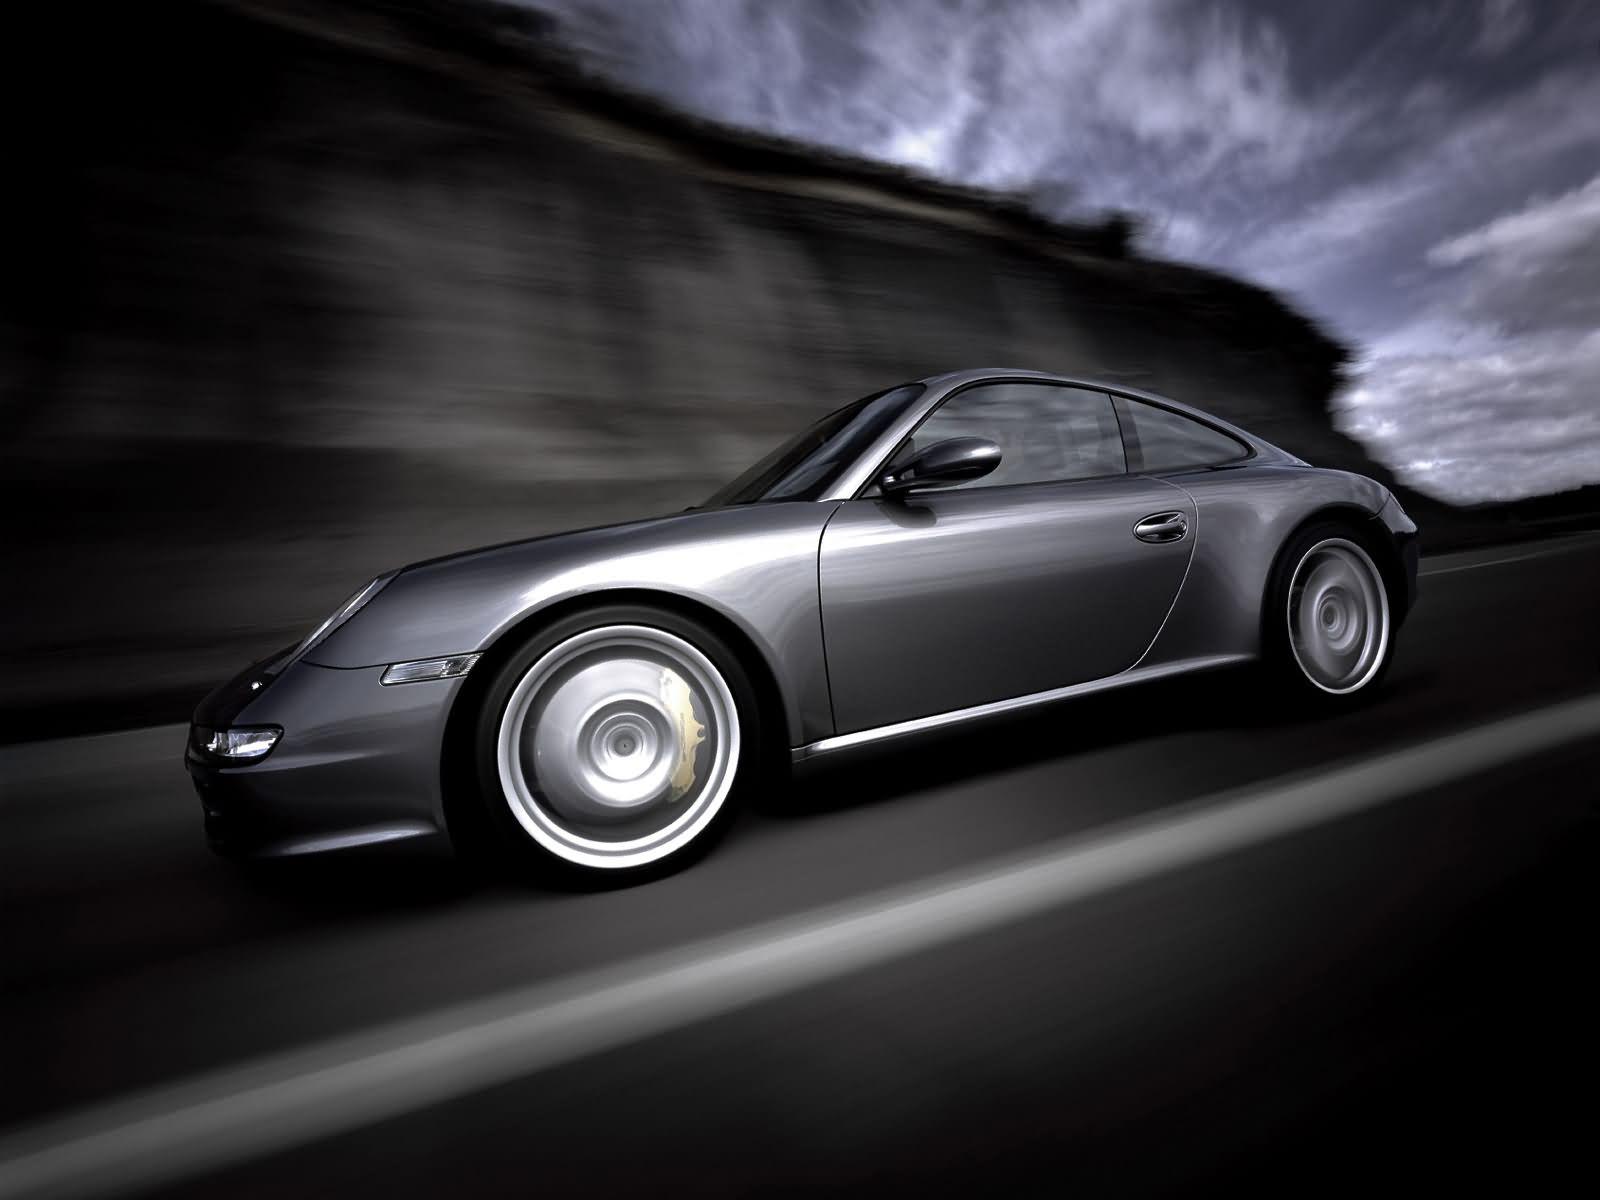 Porsche 997 turbo s wallpaper